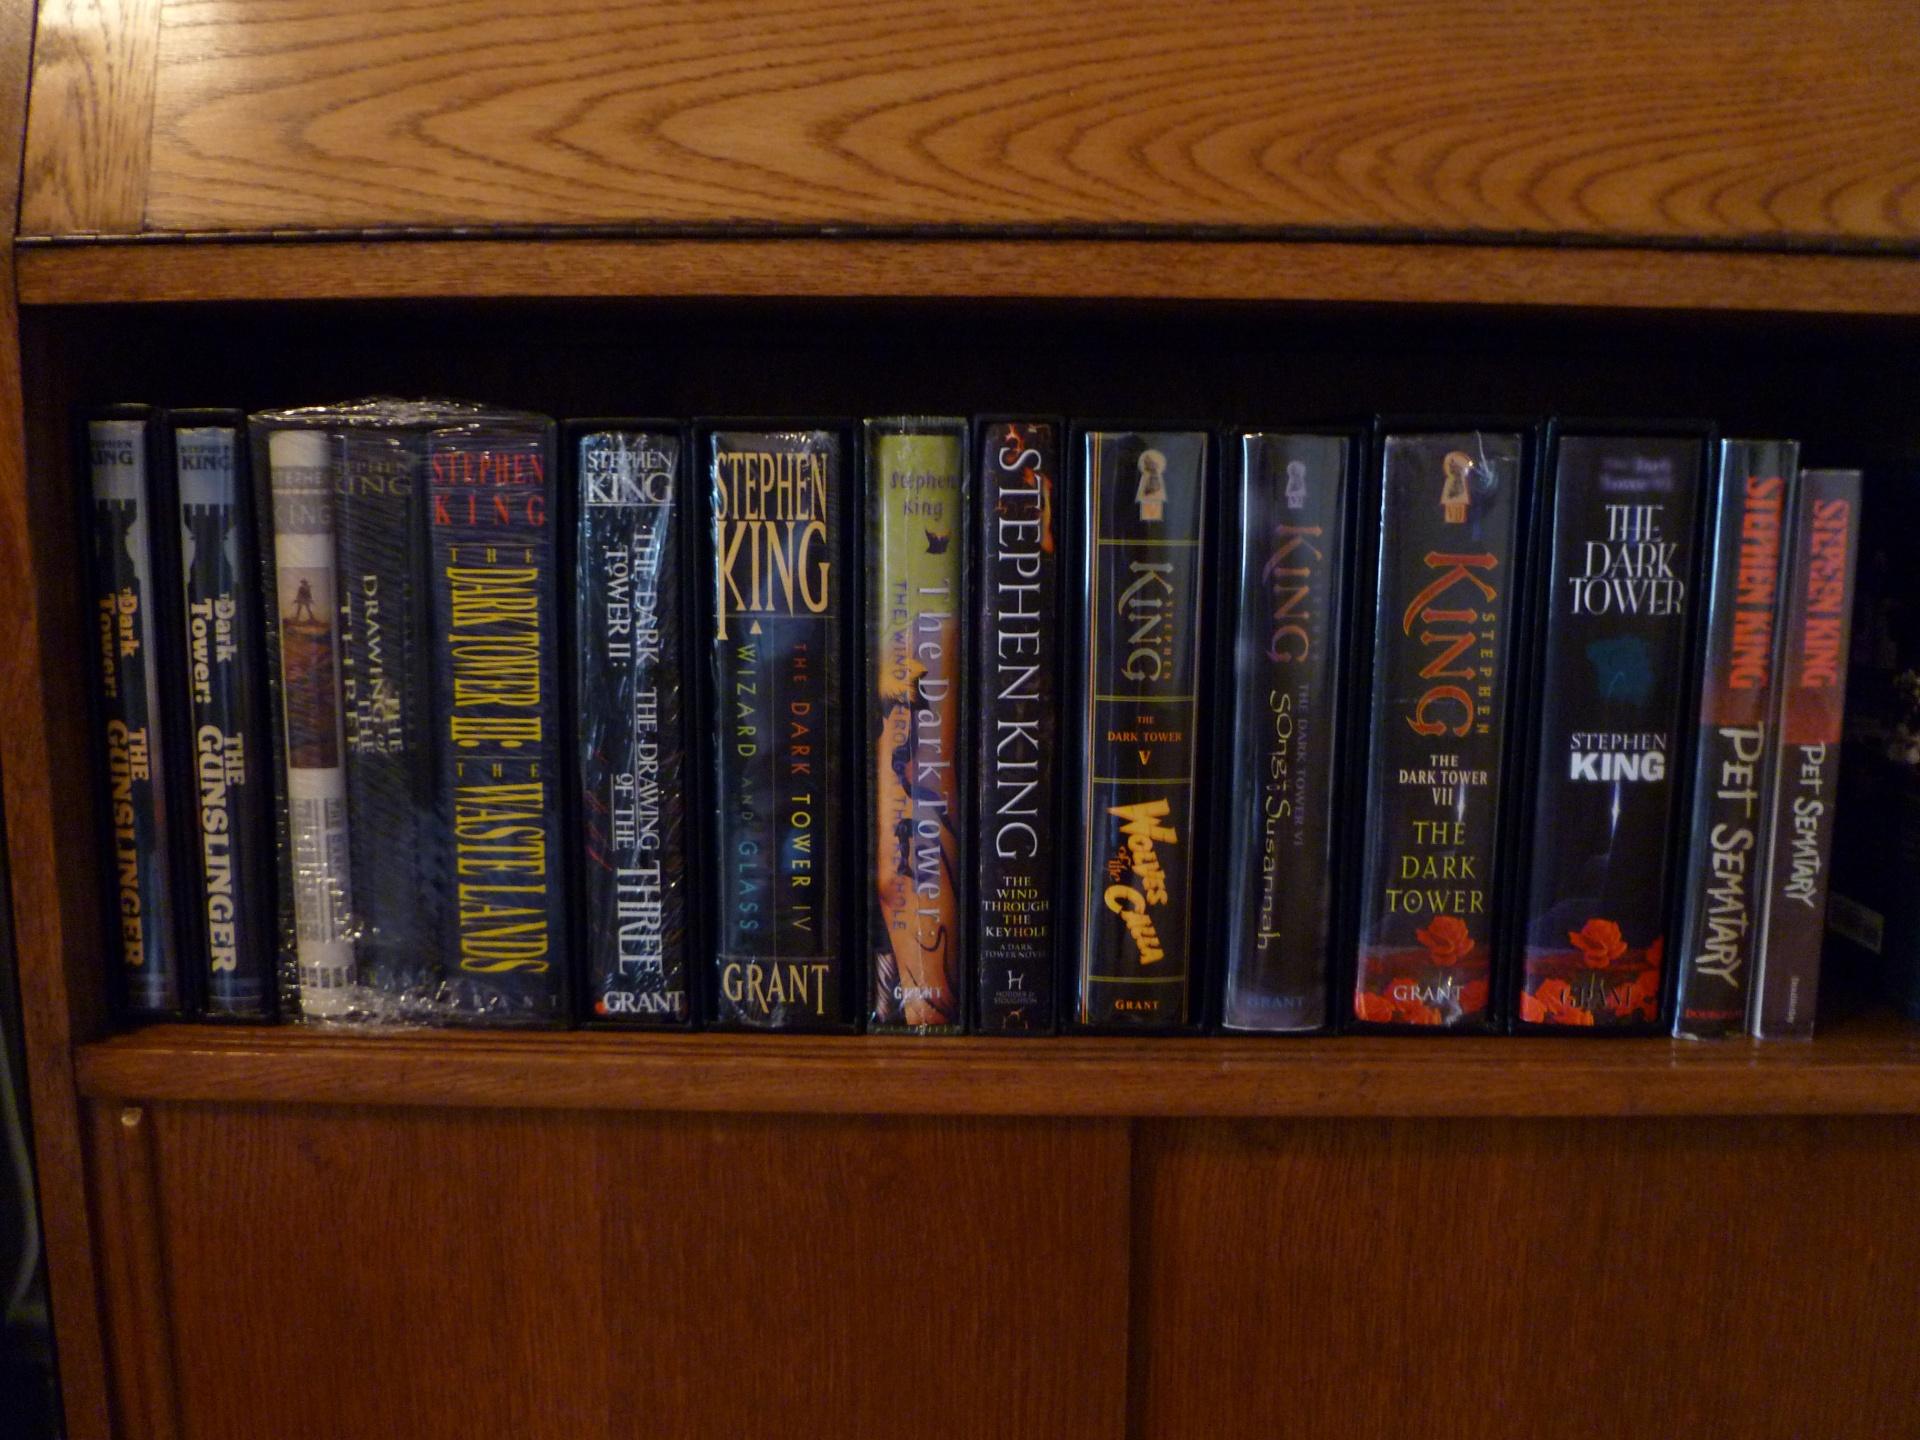 Colección de obras de Stephen King.